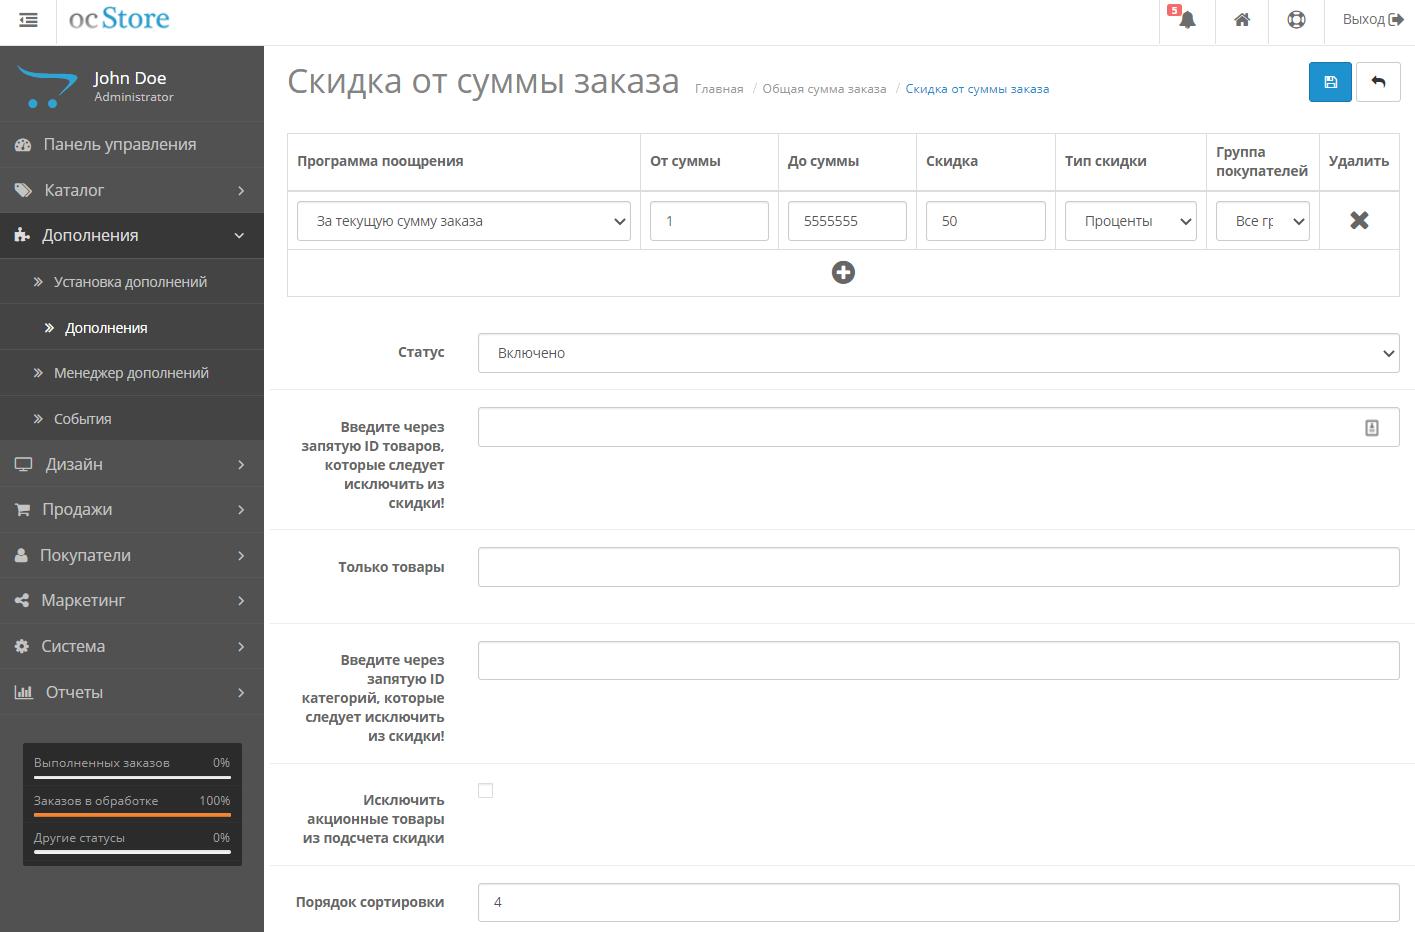 Cкидка от суммы заказа для OpenCart и ocStore изображение №4